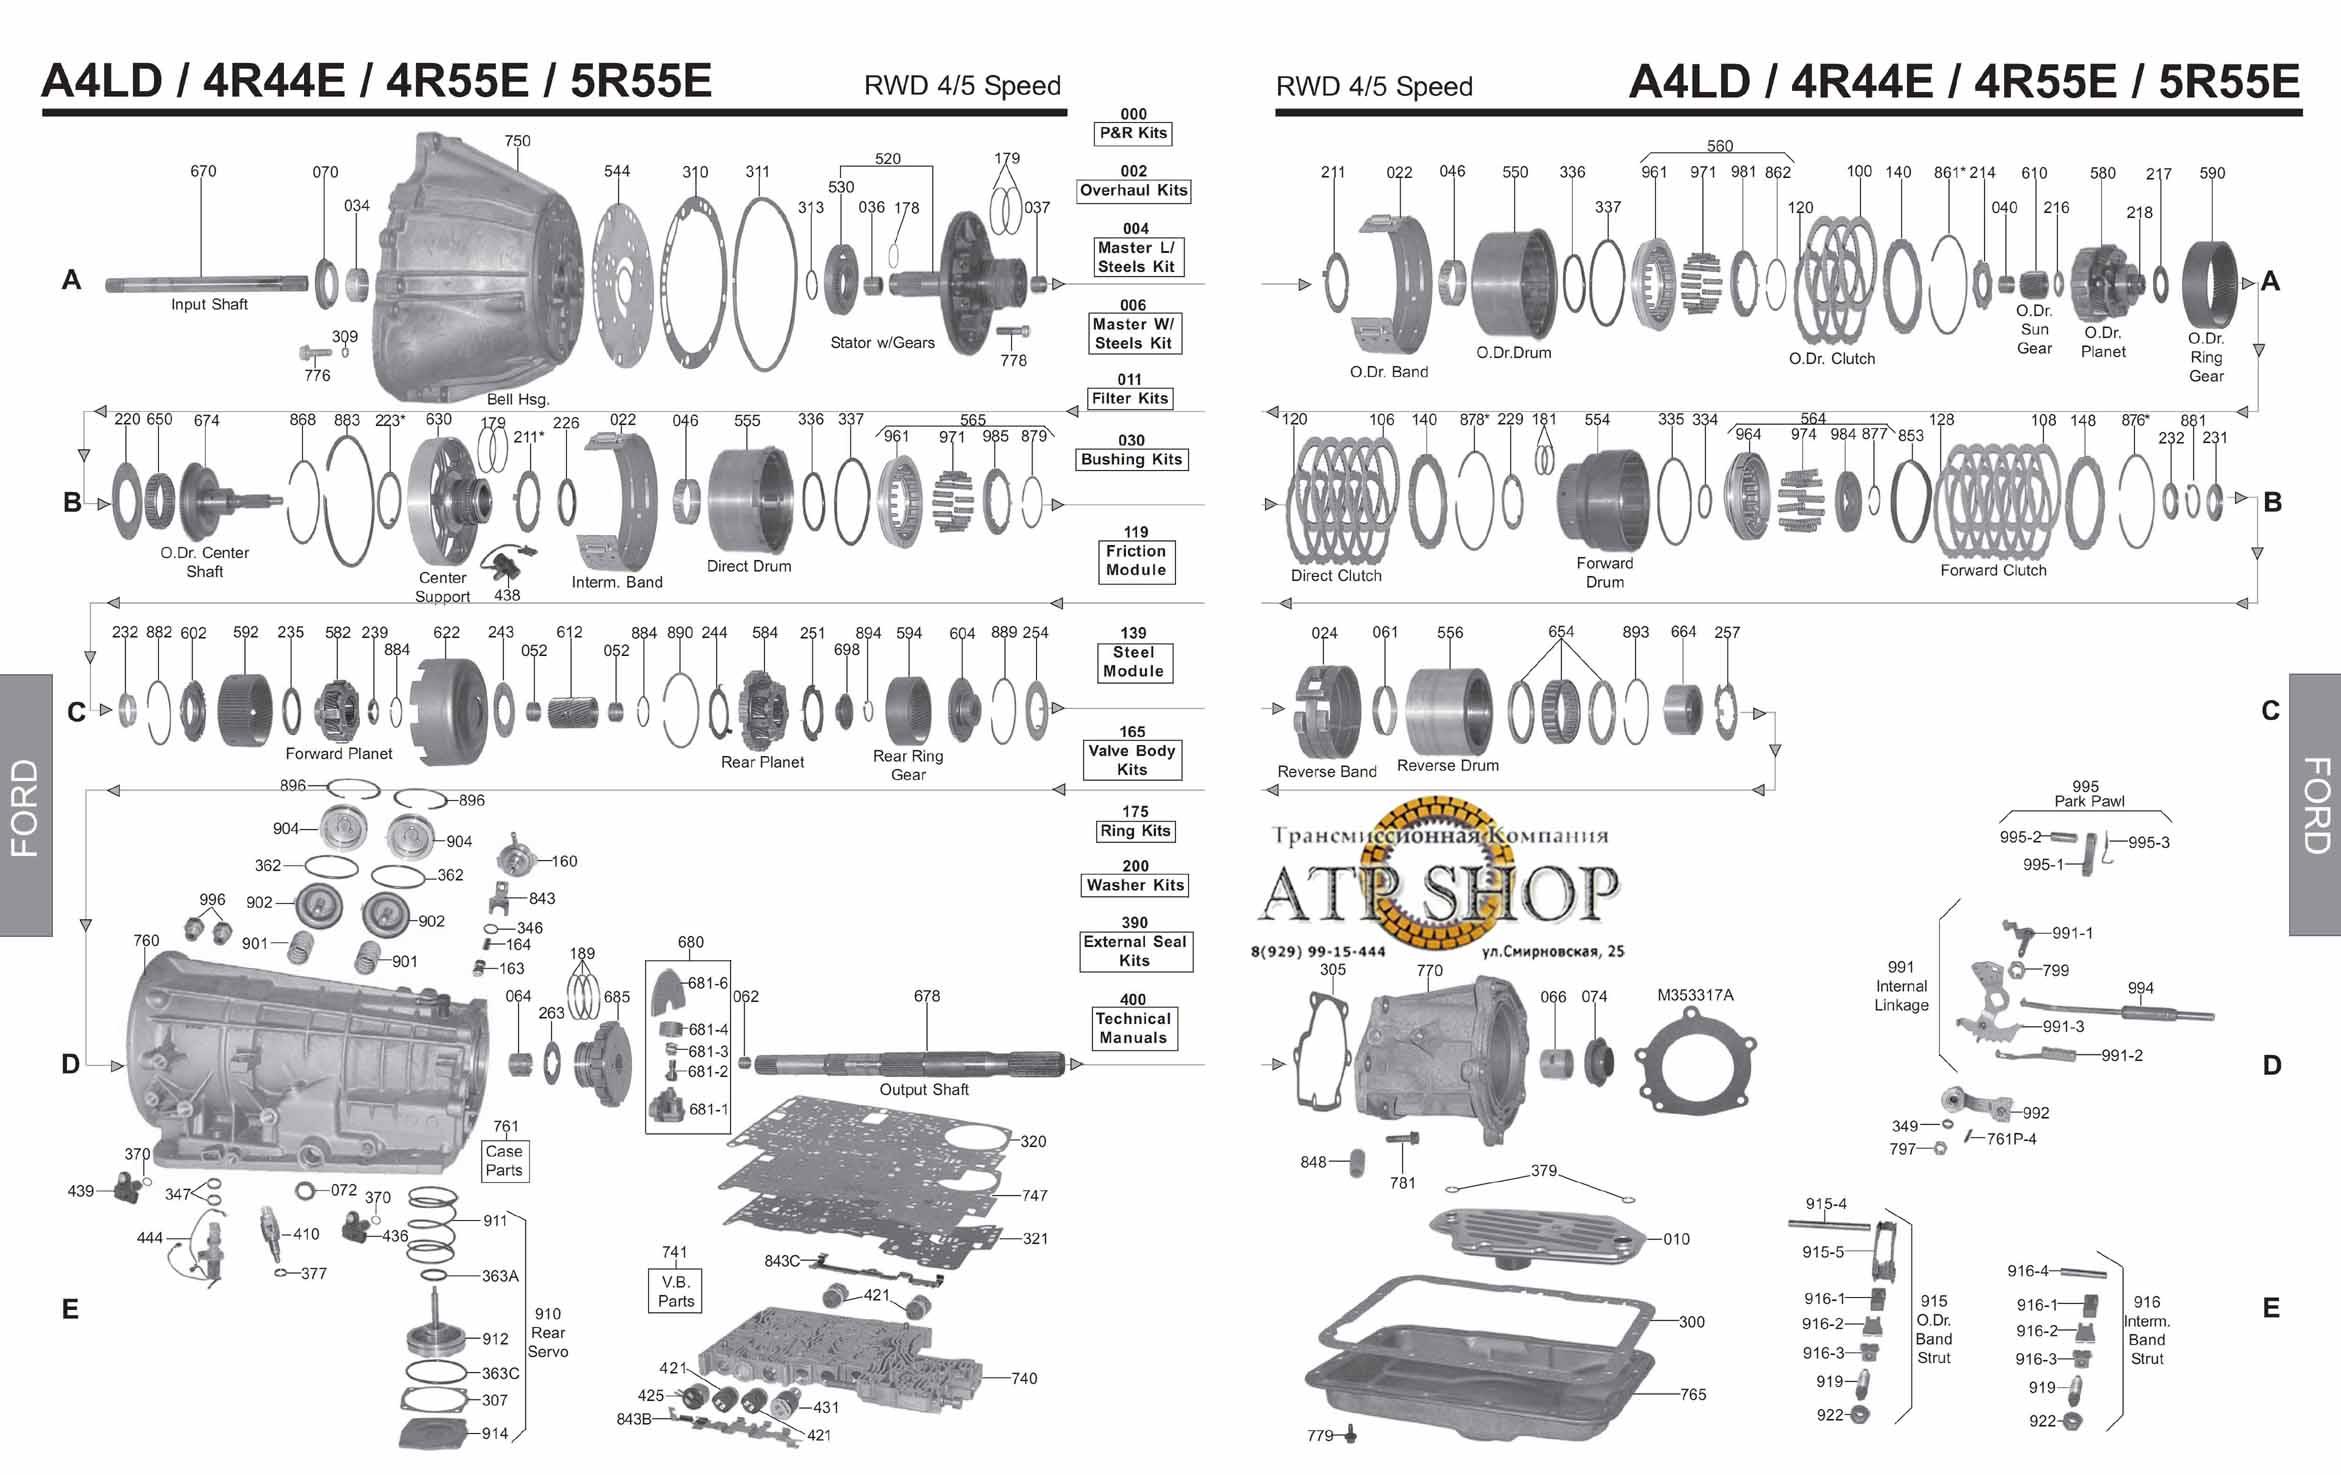 F_A4LD?resize\\\\\\\\\\\\\\\=665%2C419 hotsy burner wiring diagram hotsy pump diagram \u2022 free wiring  at gsmx.co